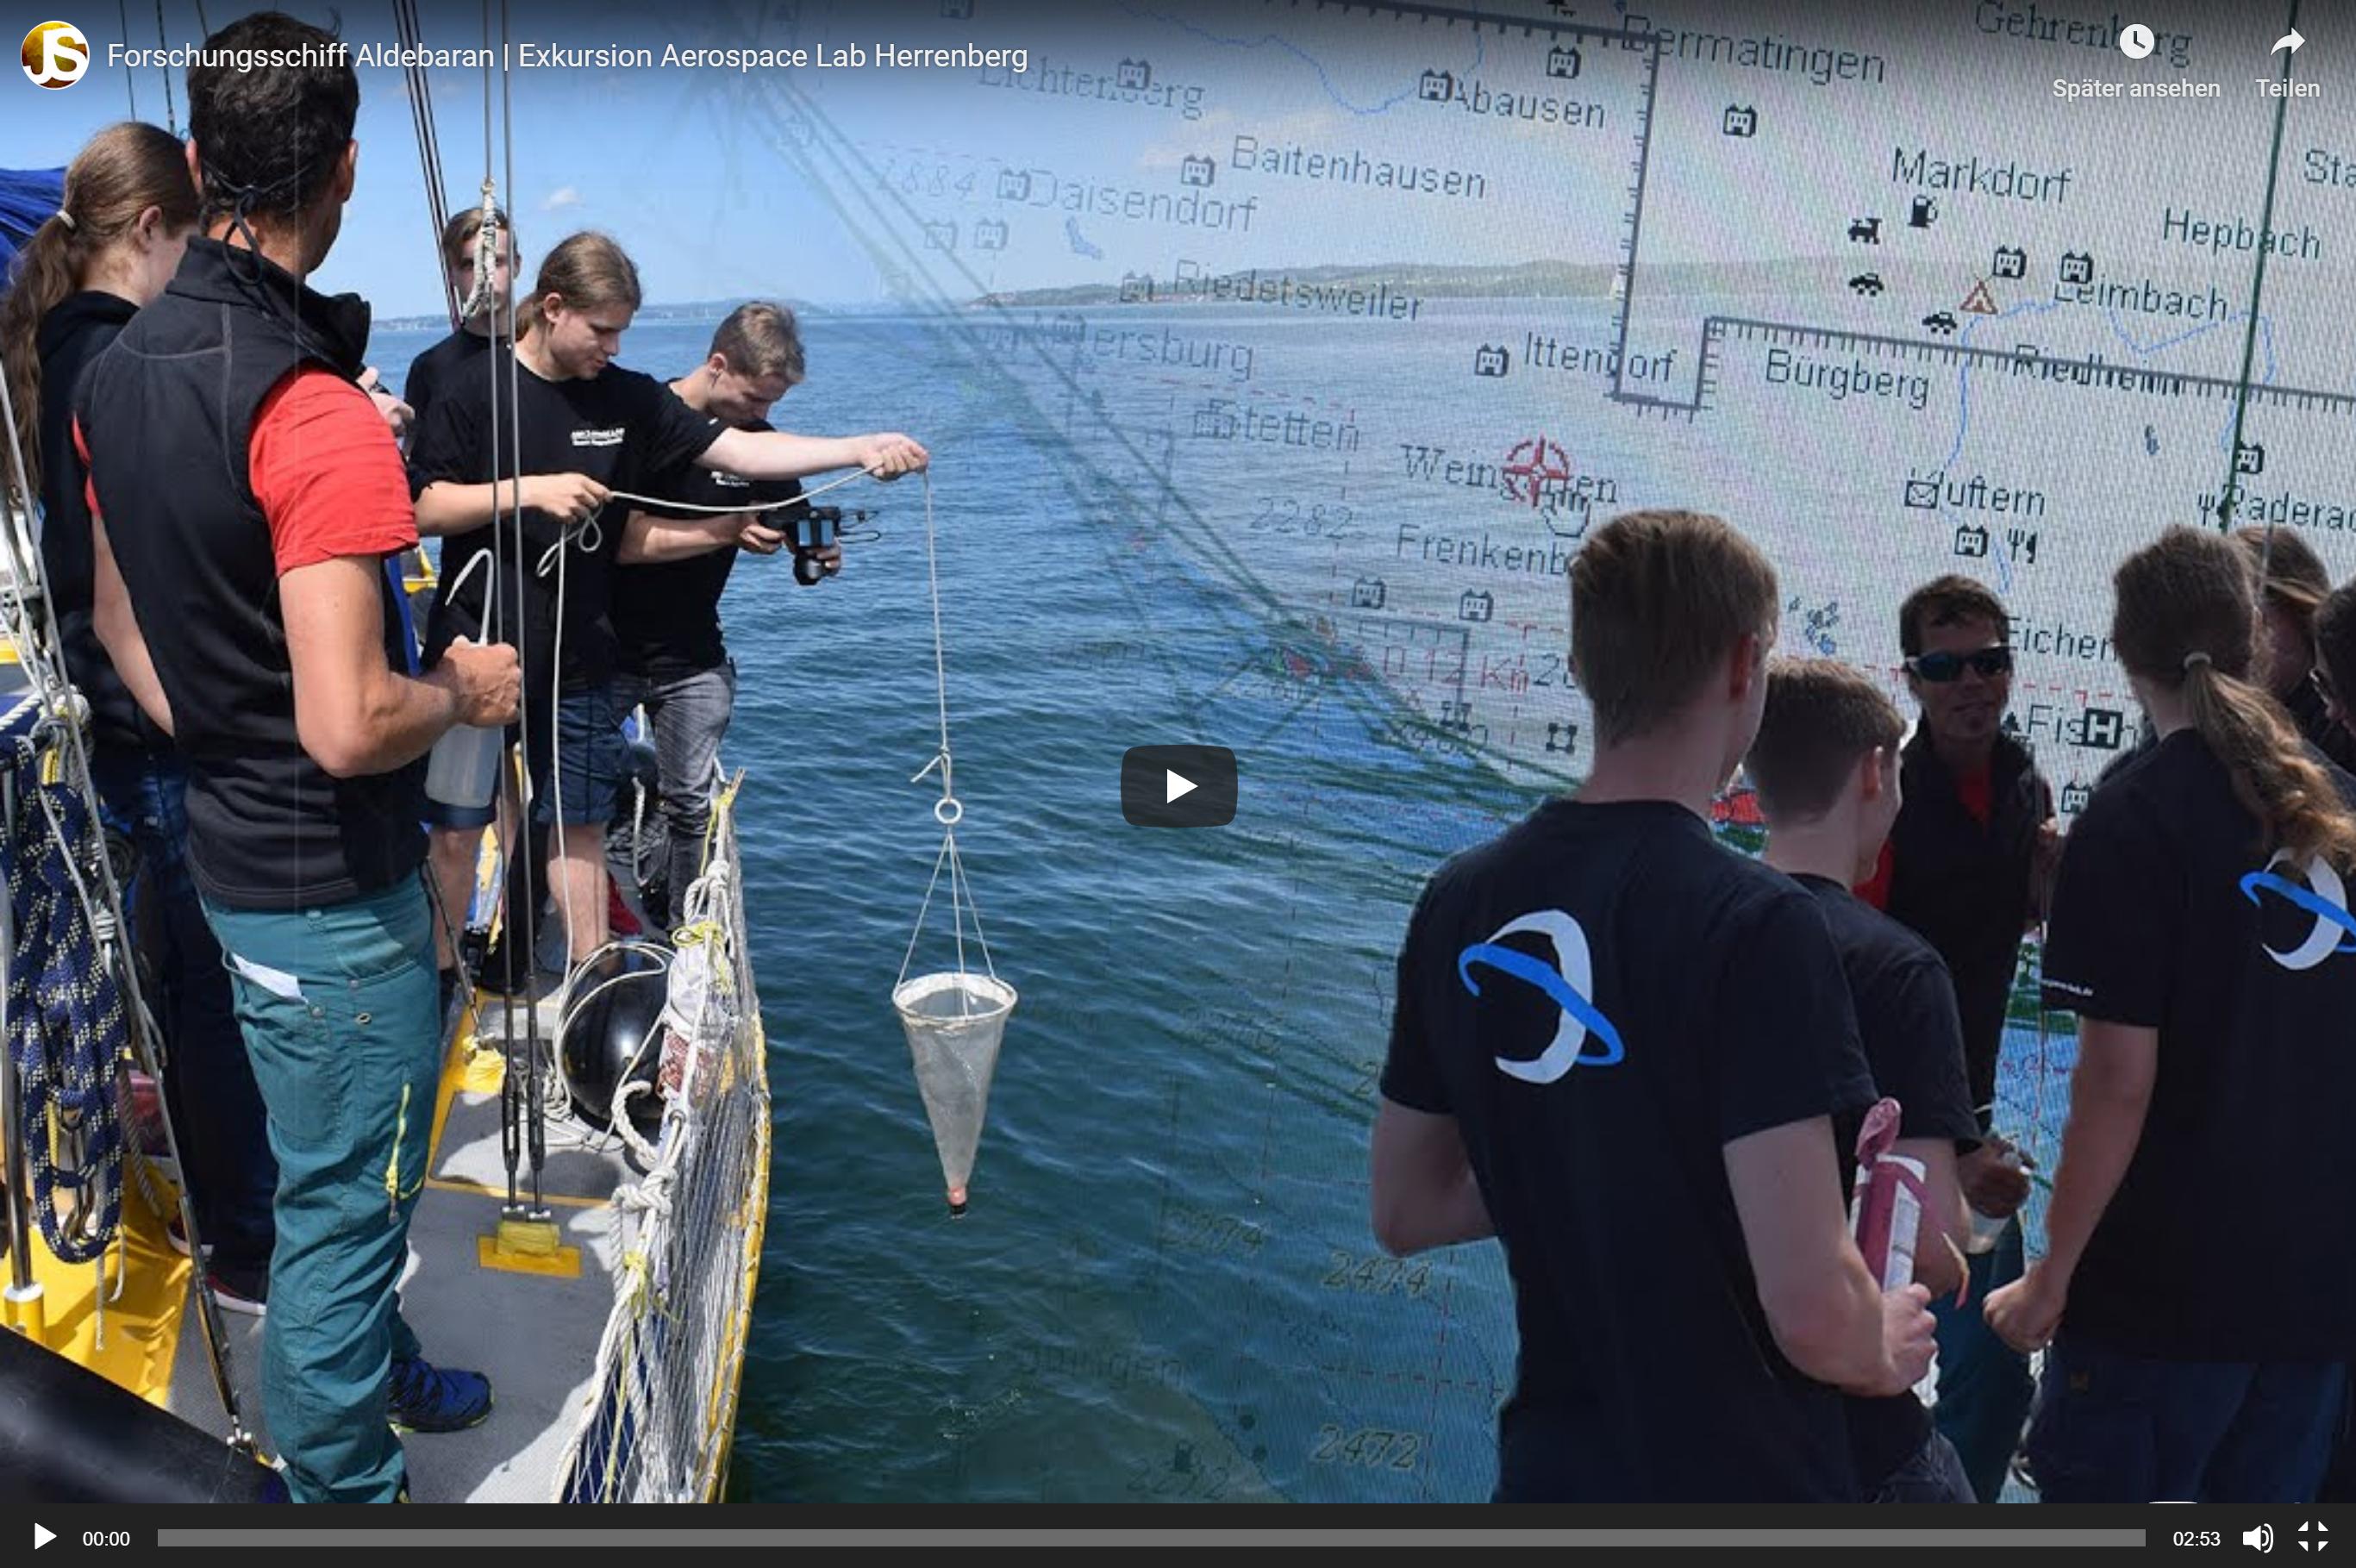 Thumbnail-Exkursion Forschungsschiff Aldebaran – AEROSPACE LAB